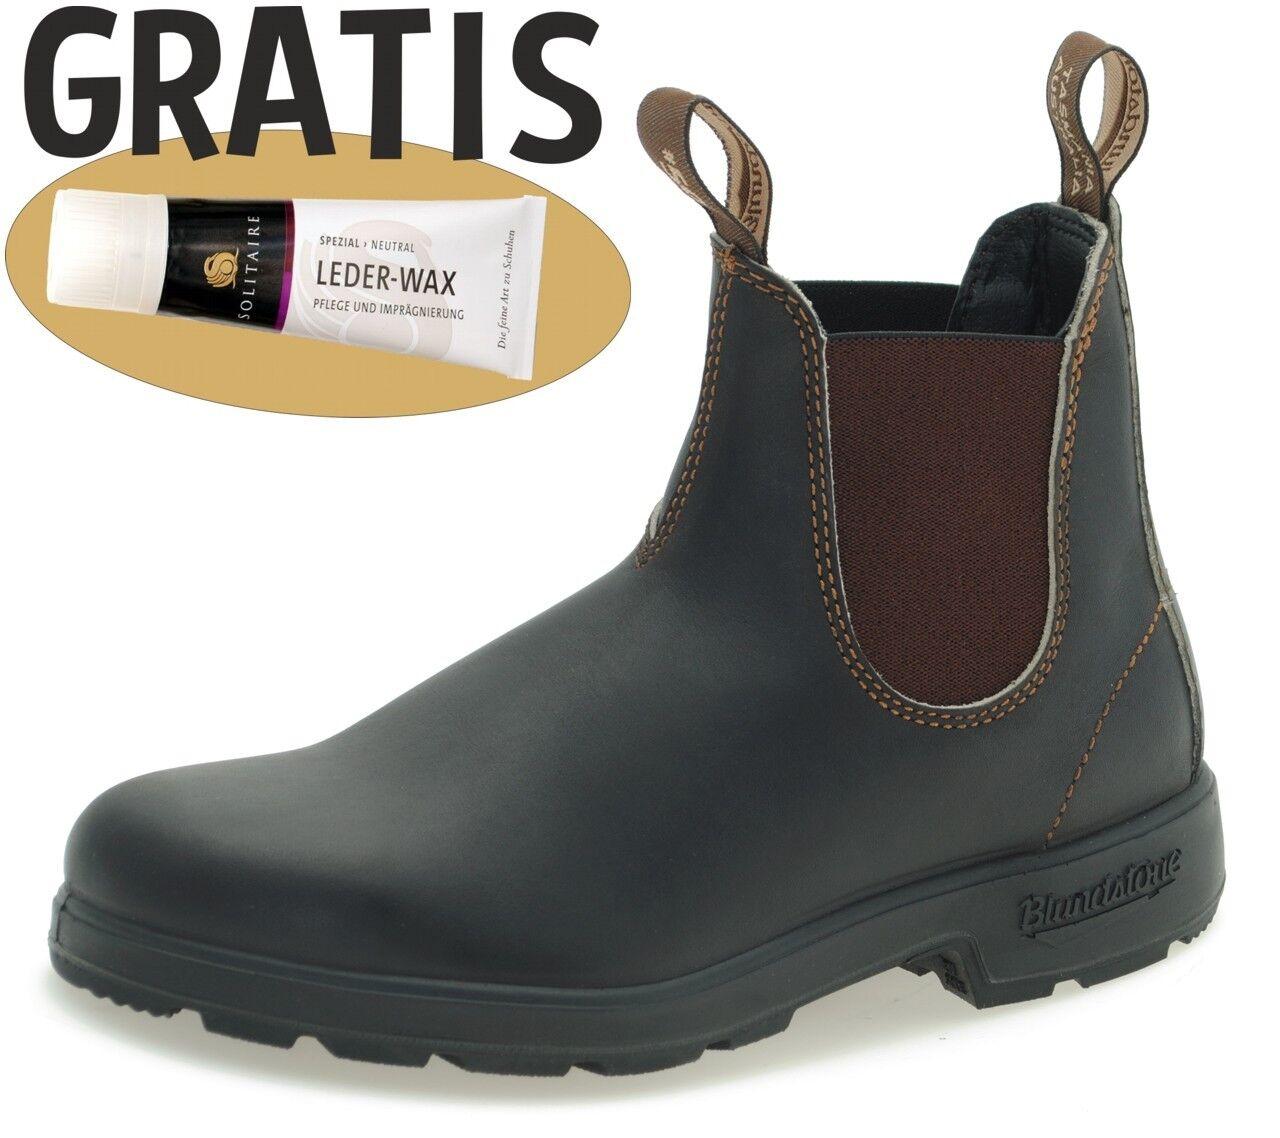 Blundstone 500 Chelsea Stiefel Stiefel Leder Outdoor Büro - Stout Braun + Lederwax